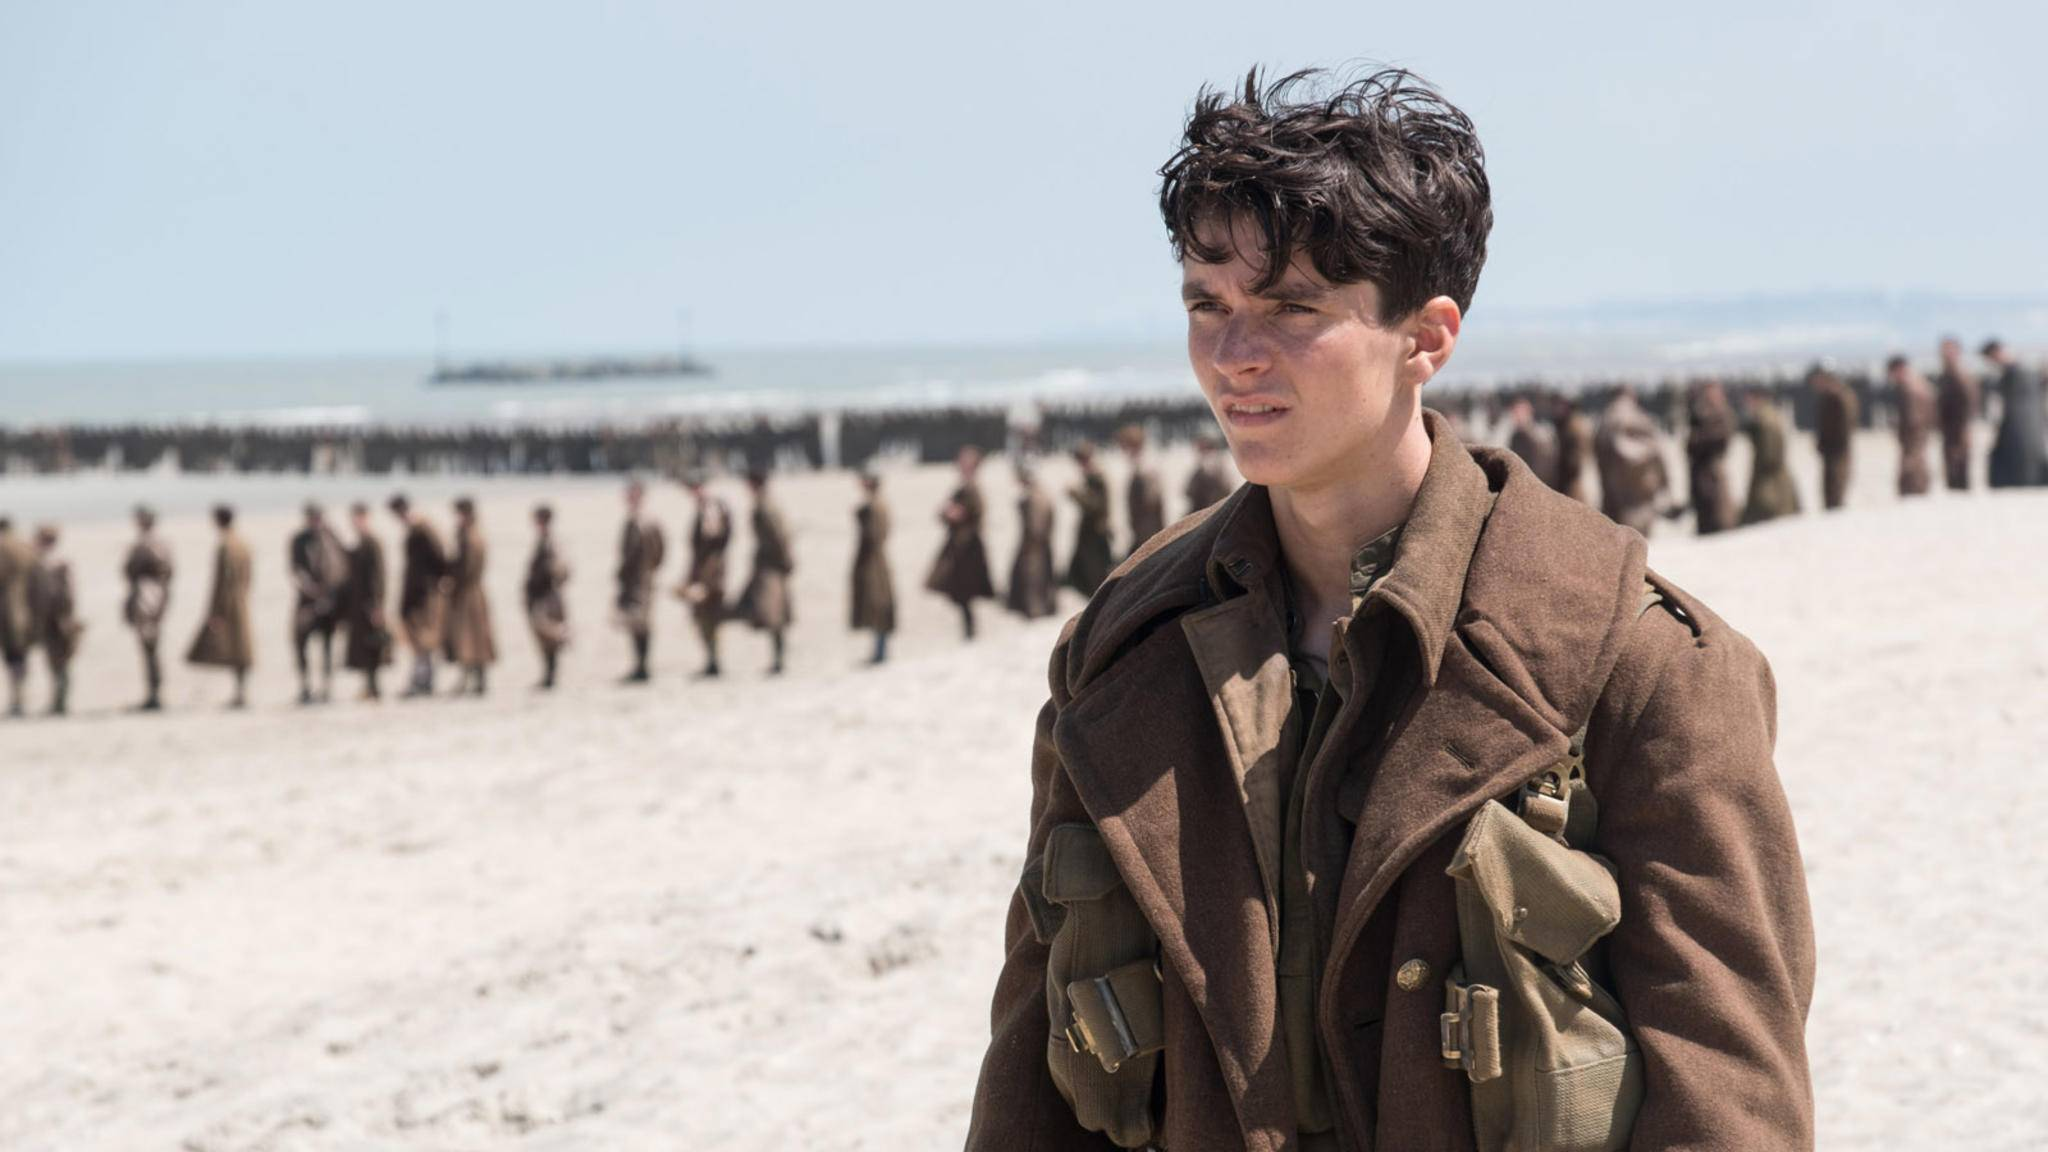 Die 10 besten Filme 2017 laut Rotten Tomatoes